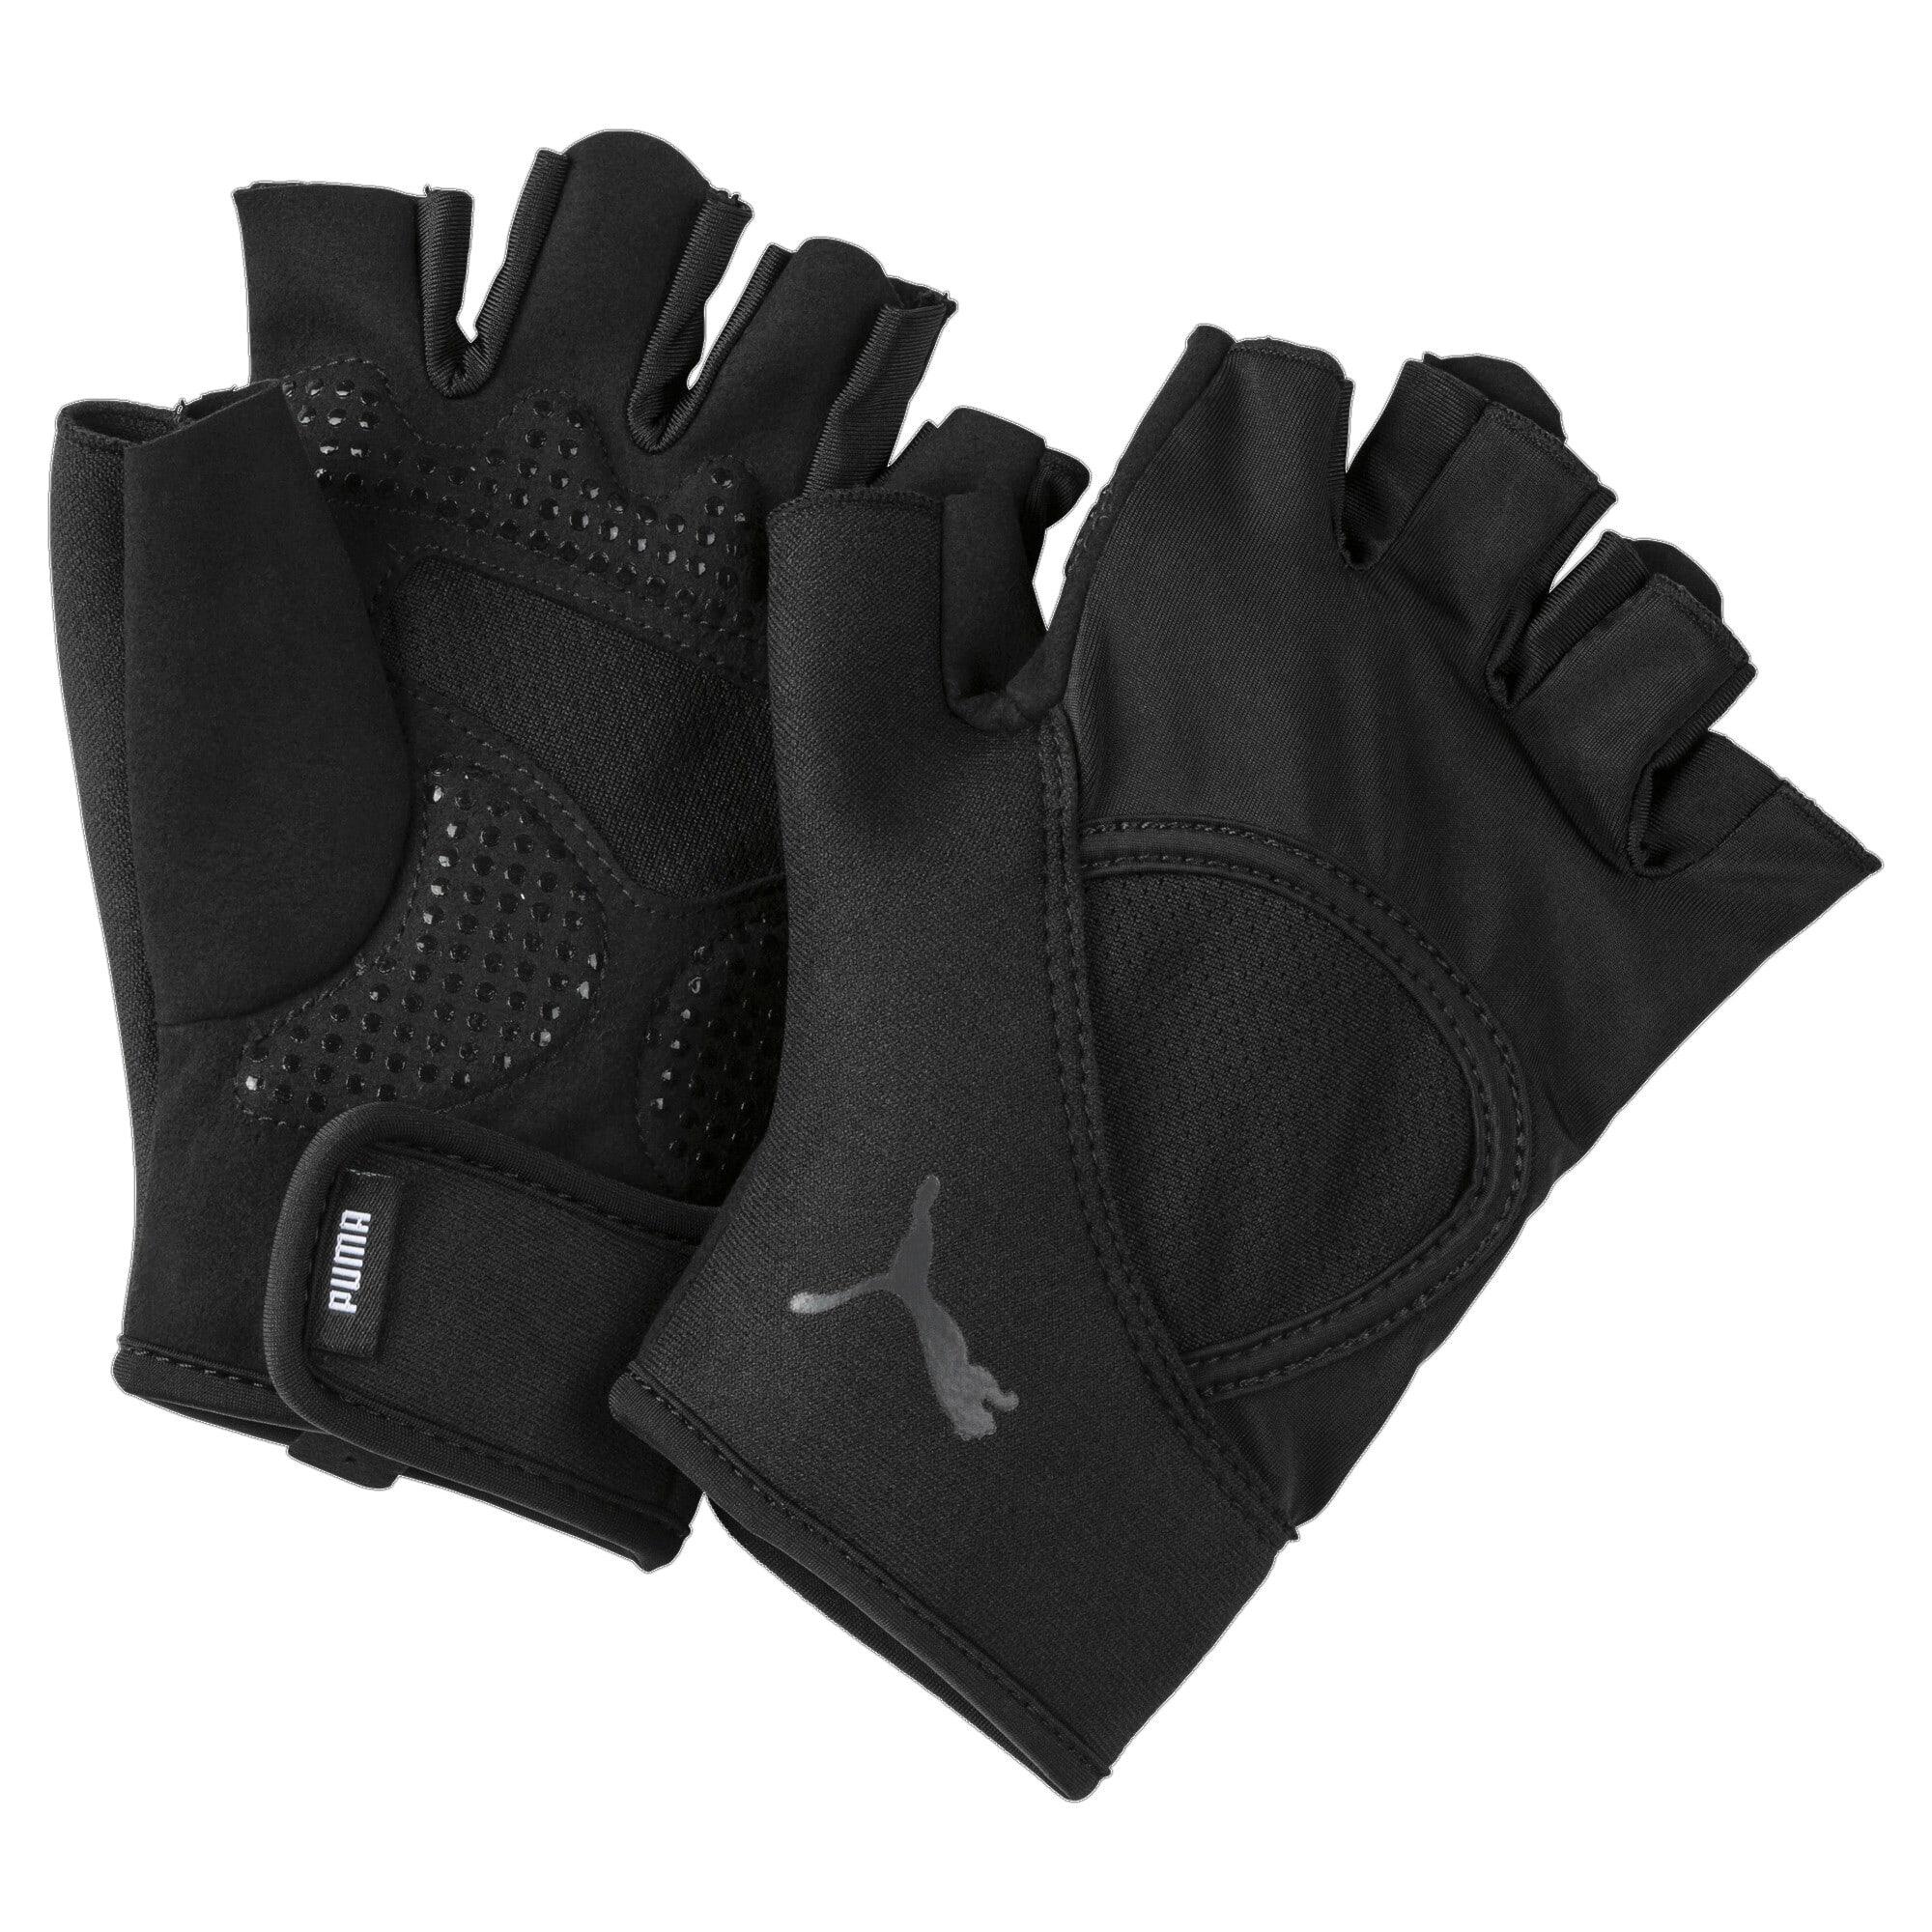 Thumbnail 1 of Essential trainingshandschoenen met vingers, Puma Black, medium